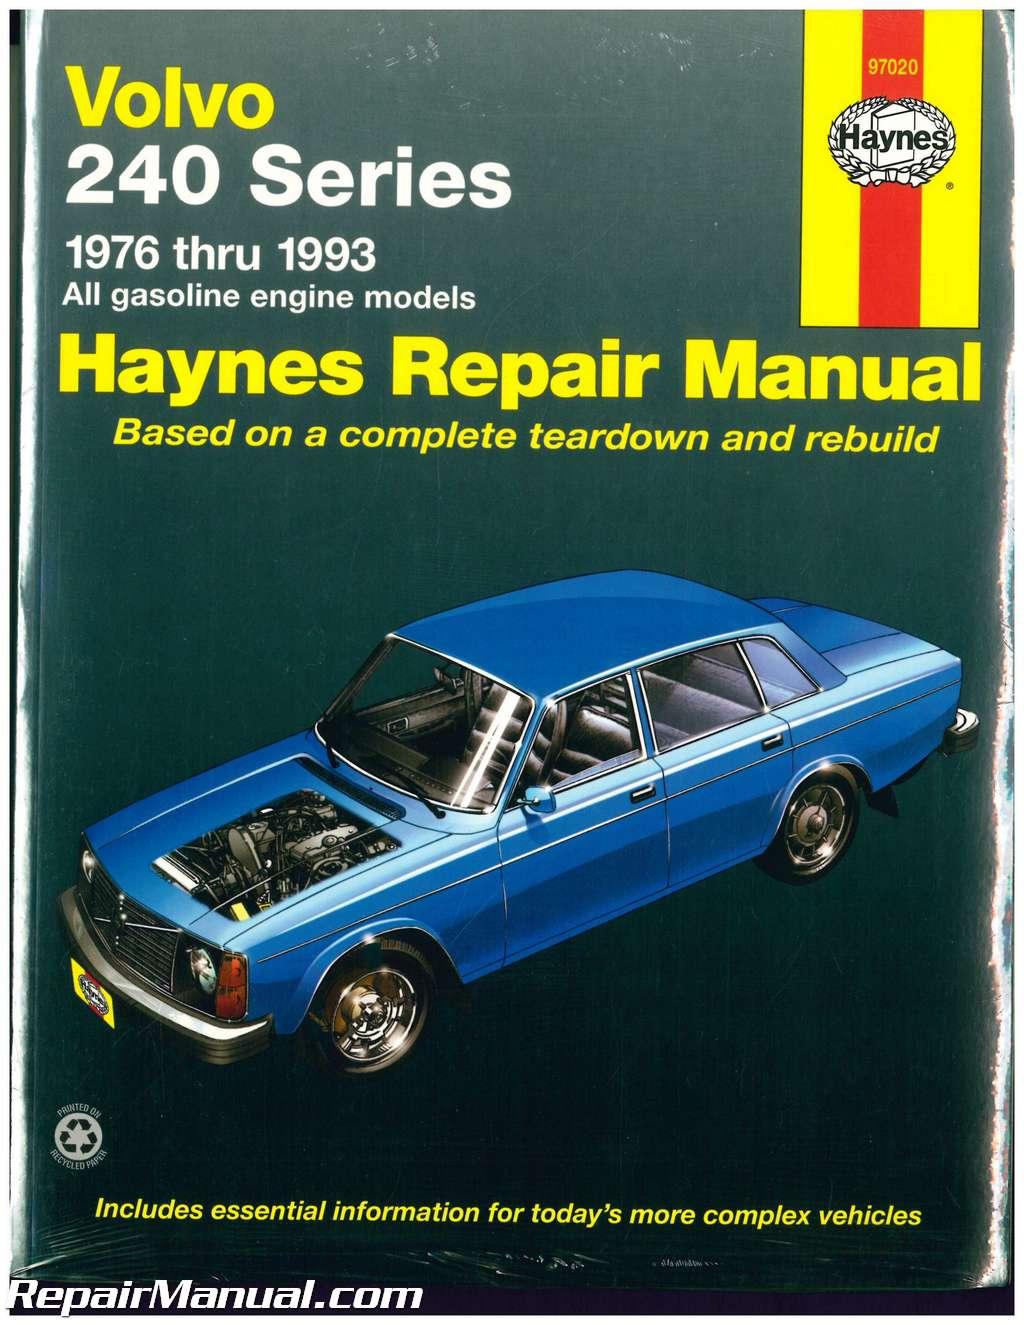 1993 volvo 240 wiring diagrams 2000 jeep grand cherokee ignition diagram fuse box panel